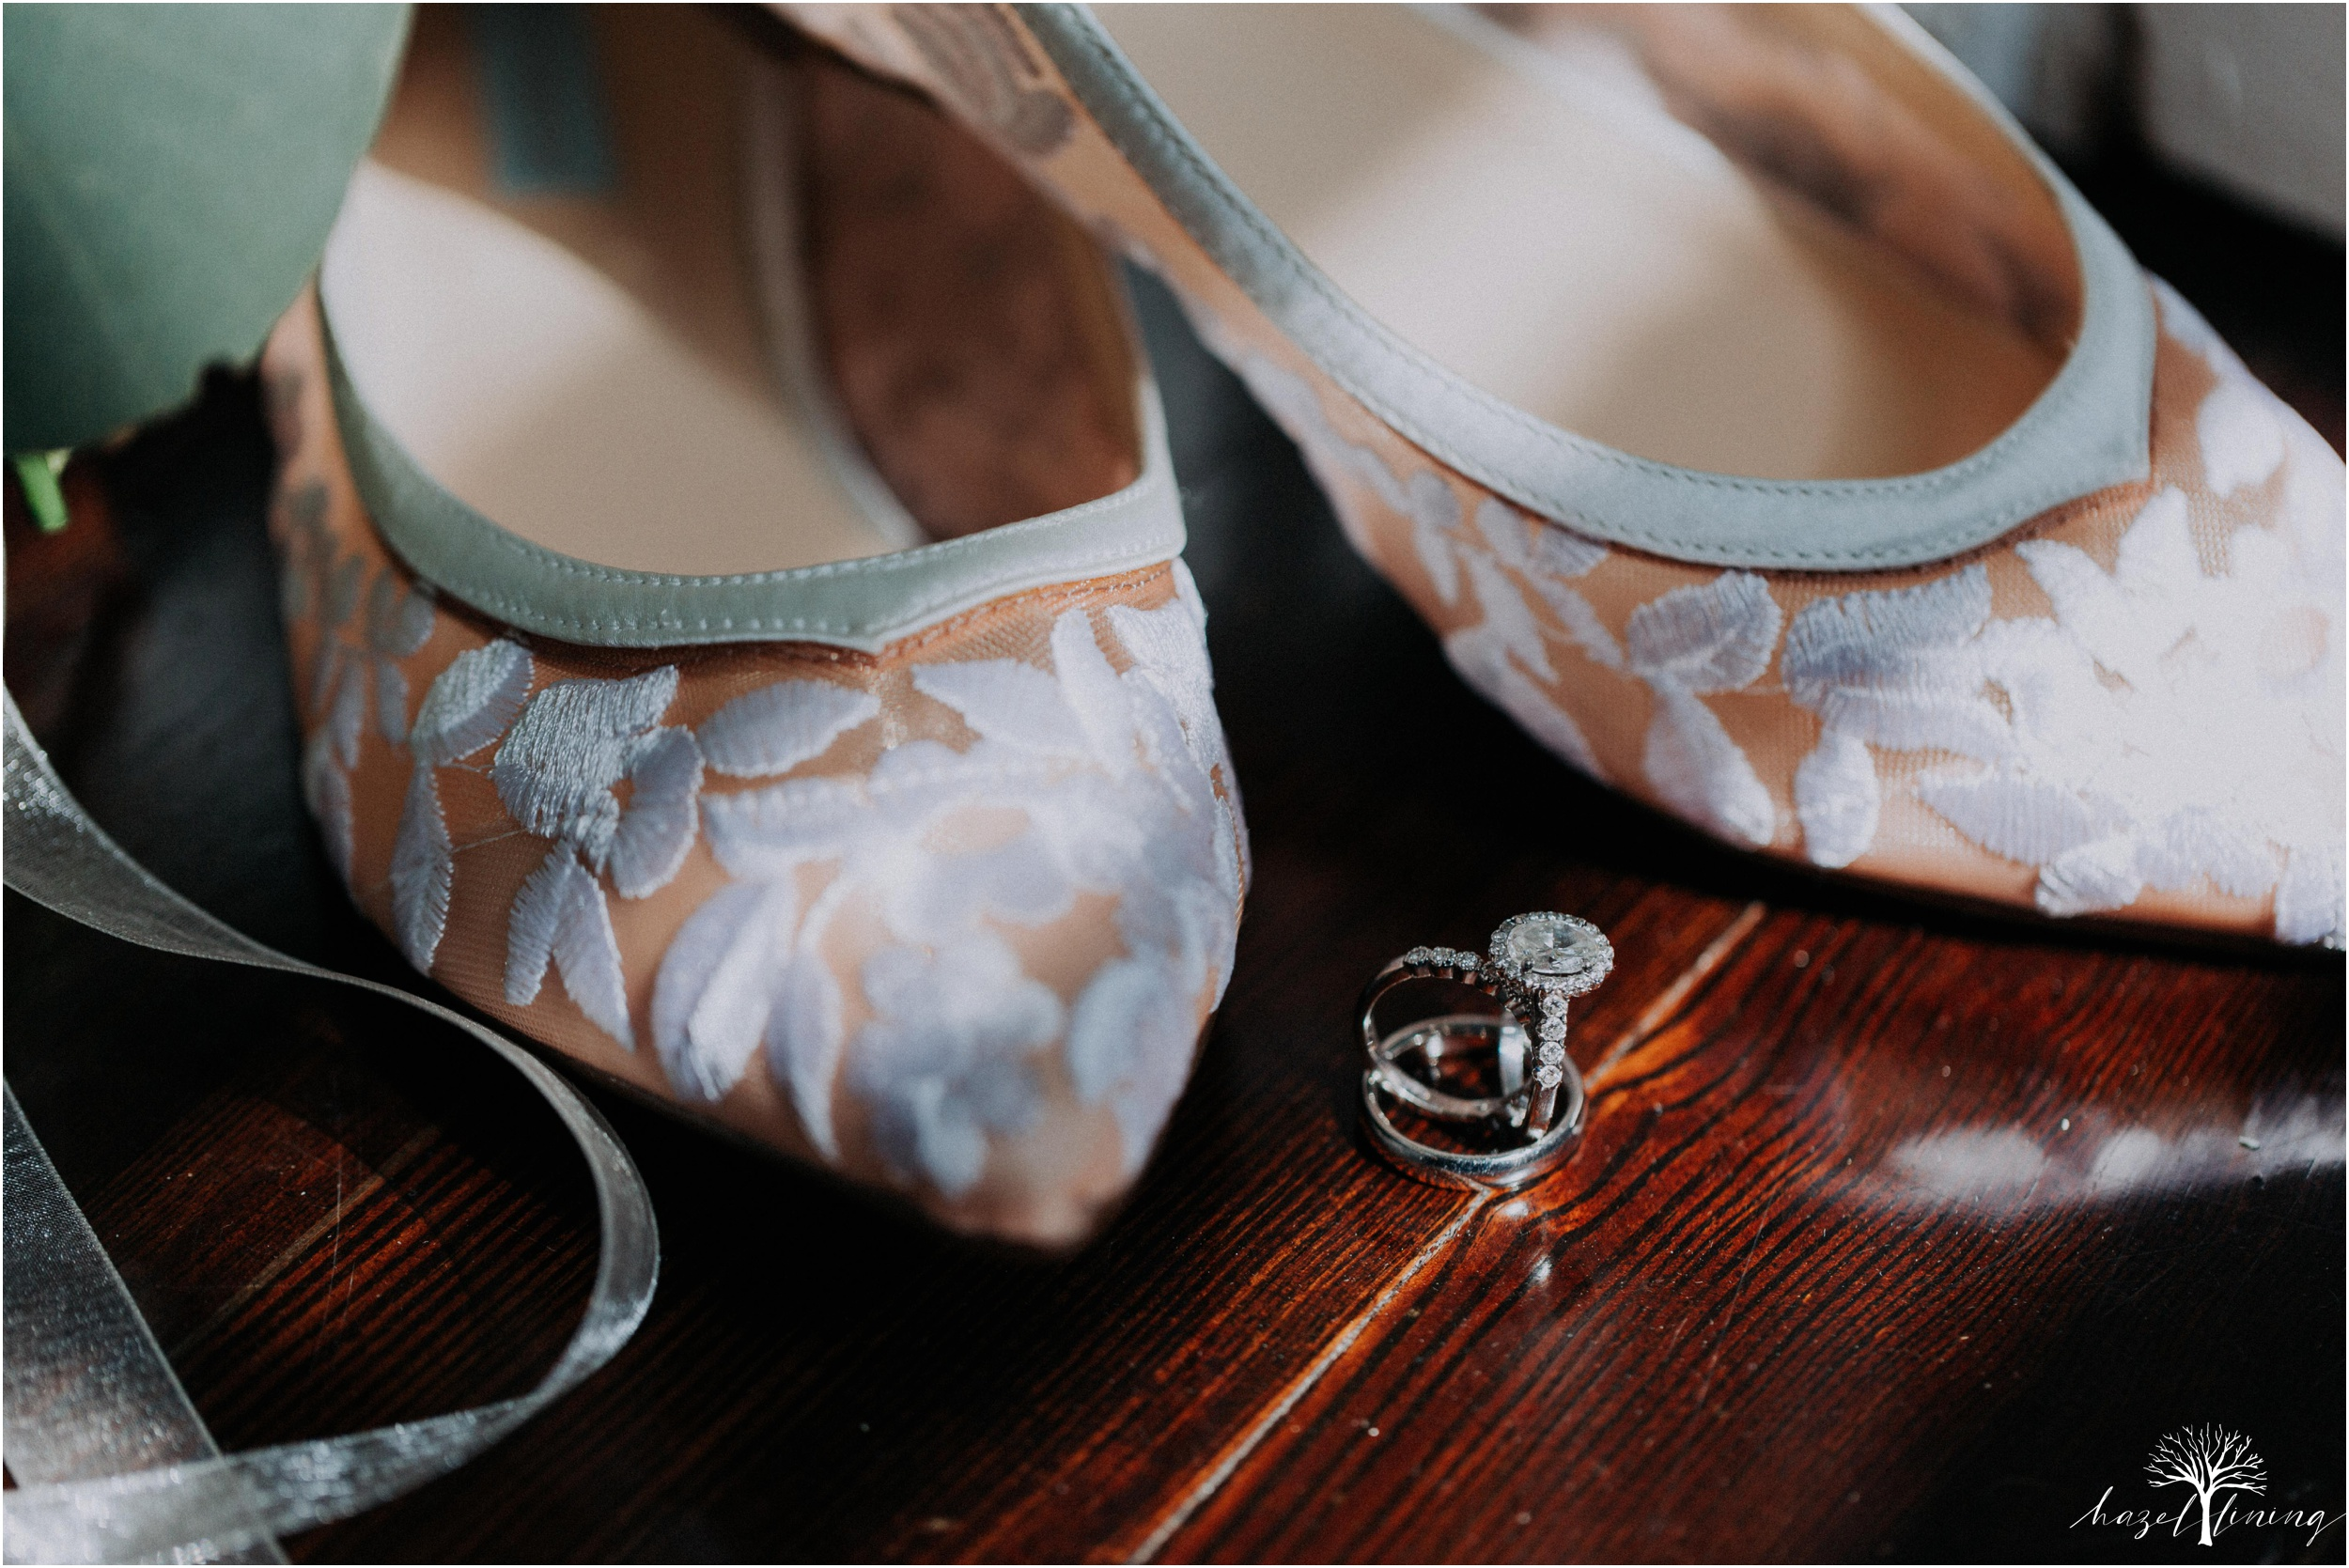 mariah-kreyling-samuel-sherratt-sherrattwiththeworld-peirce-farm-at-witch-hill-boston-massachusetts-wedding-photography-hazel-lining-travel-wedding-elopement-photography_0006.jpg